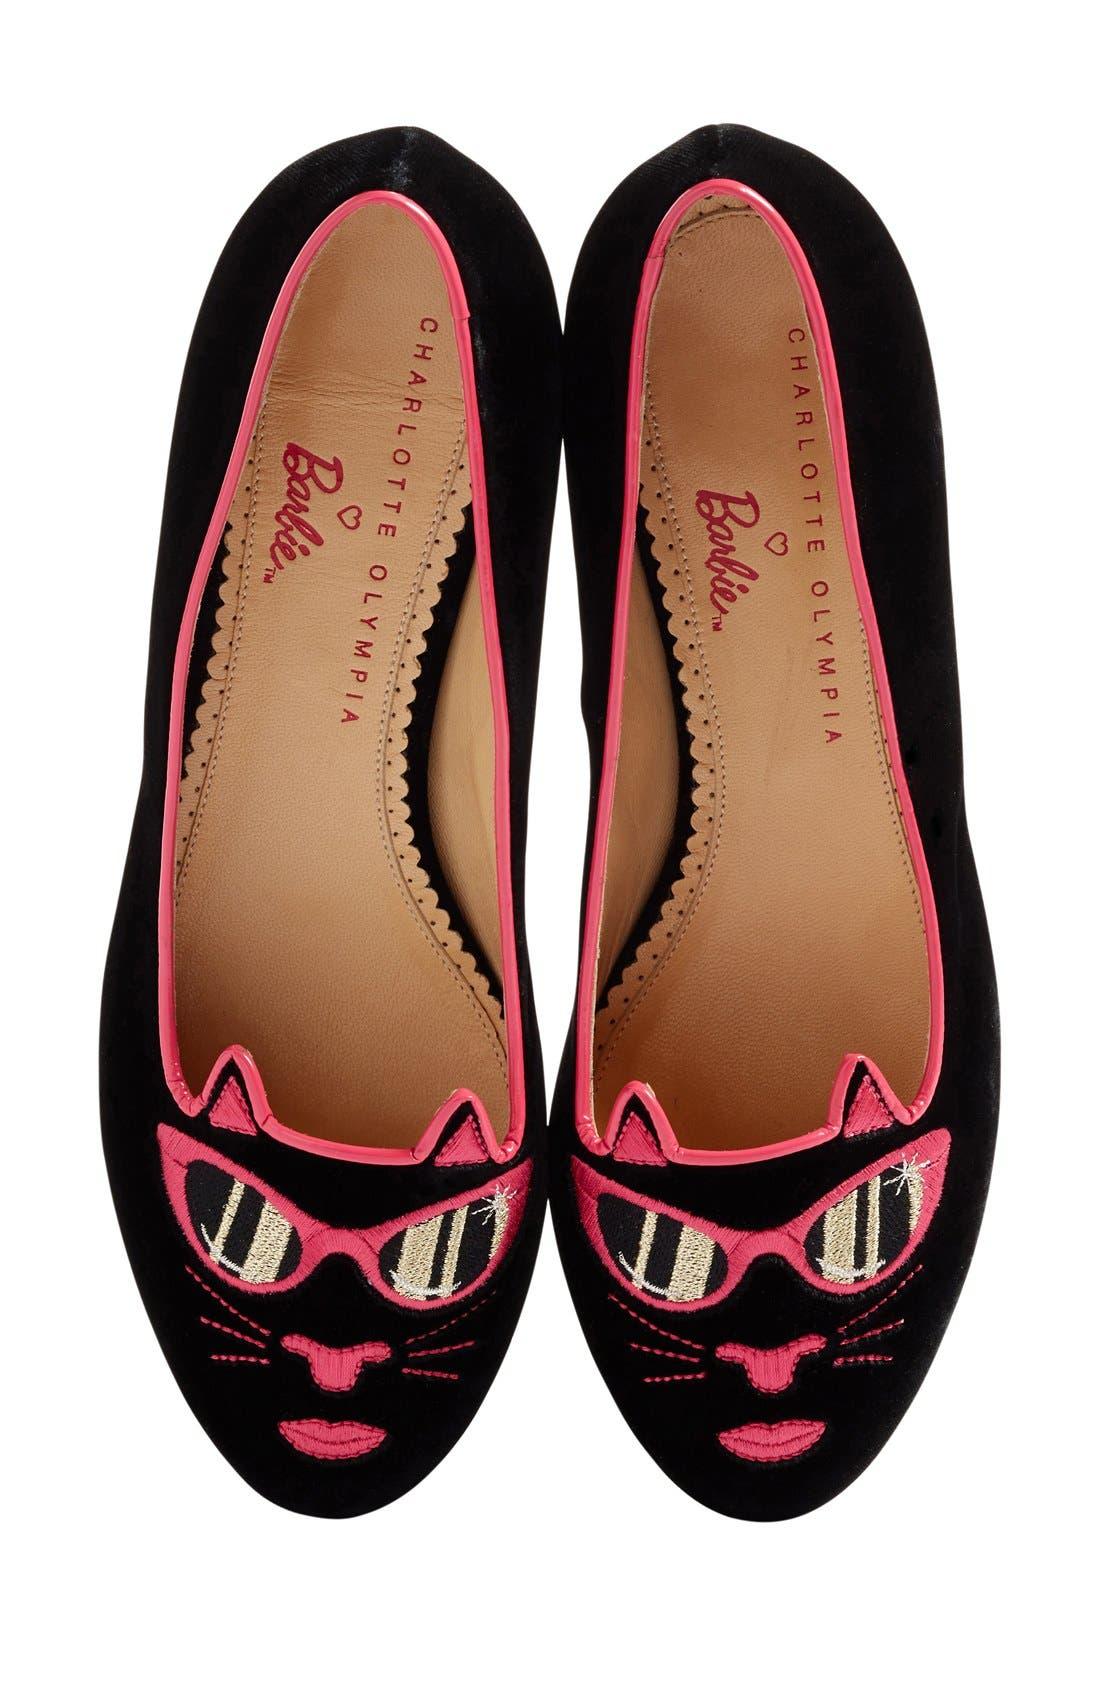 Main Image - Charlotte Olympia x Barbie® Pretty In Pink Kitty Flat (Women)